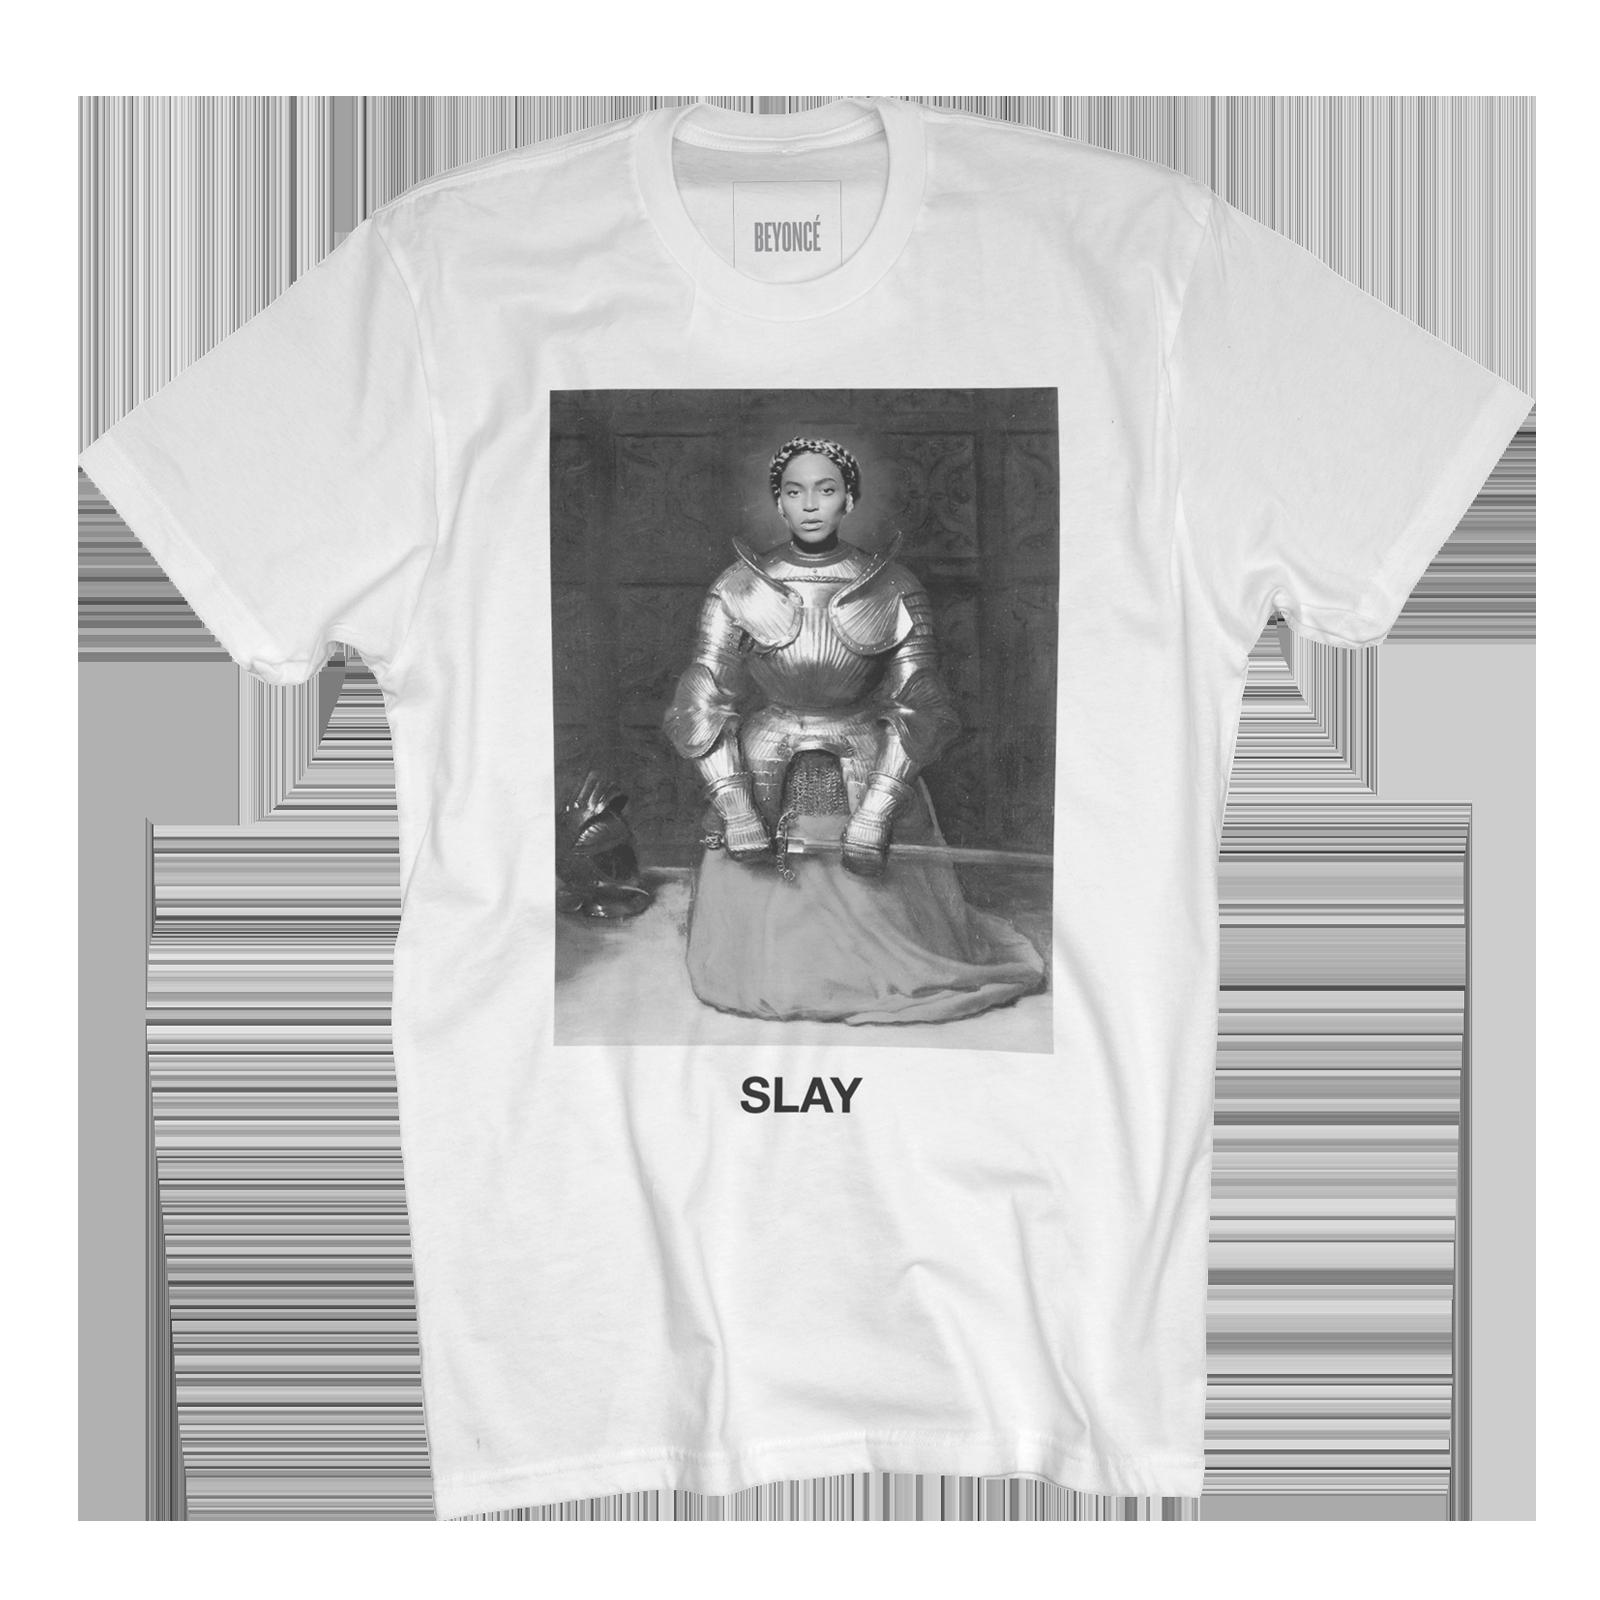 download Beyonc tee slay t. Beyonce transparent formation